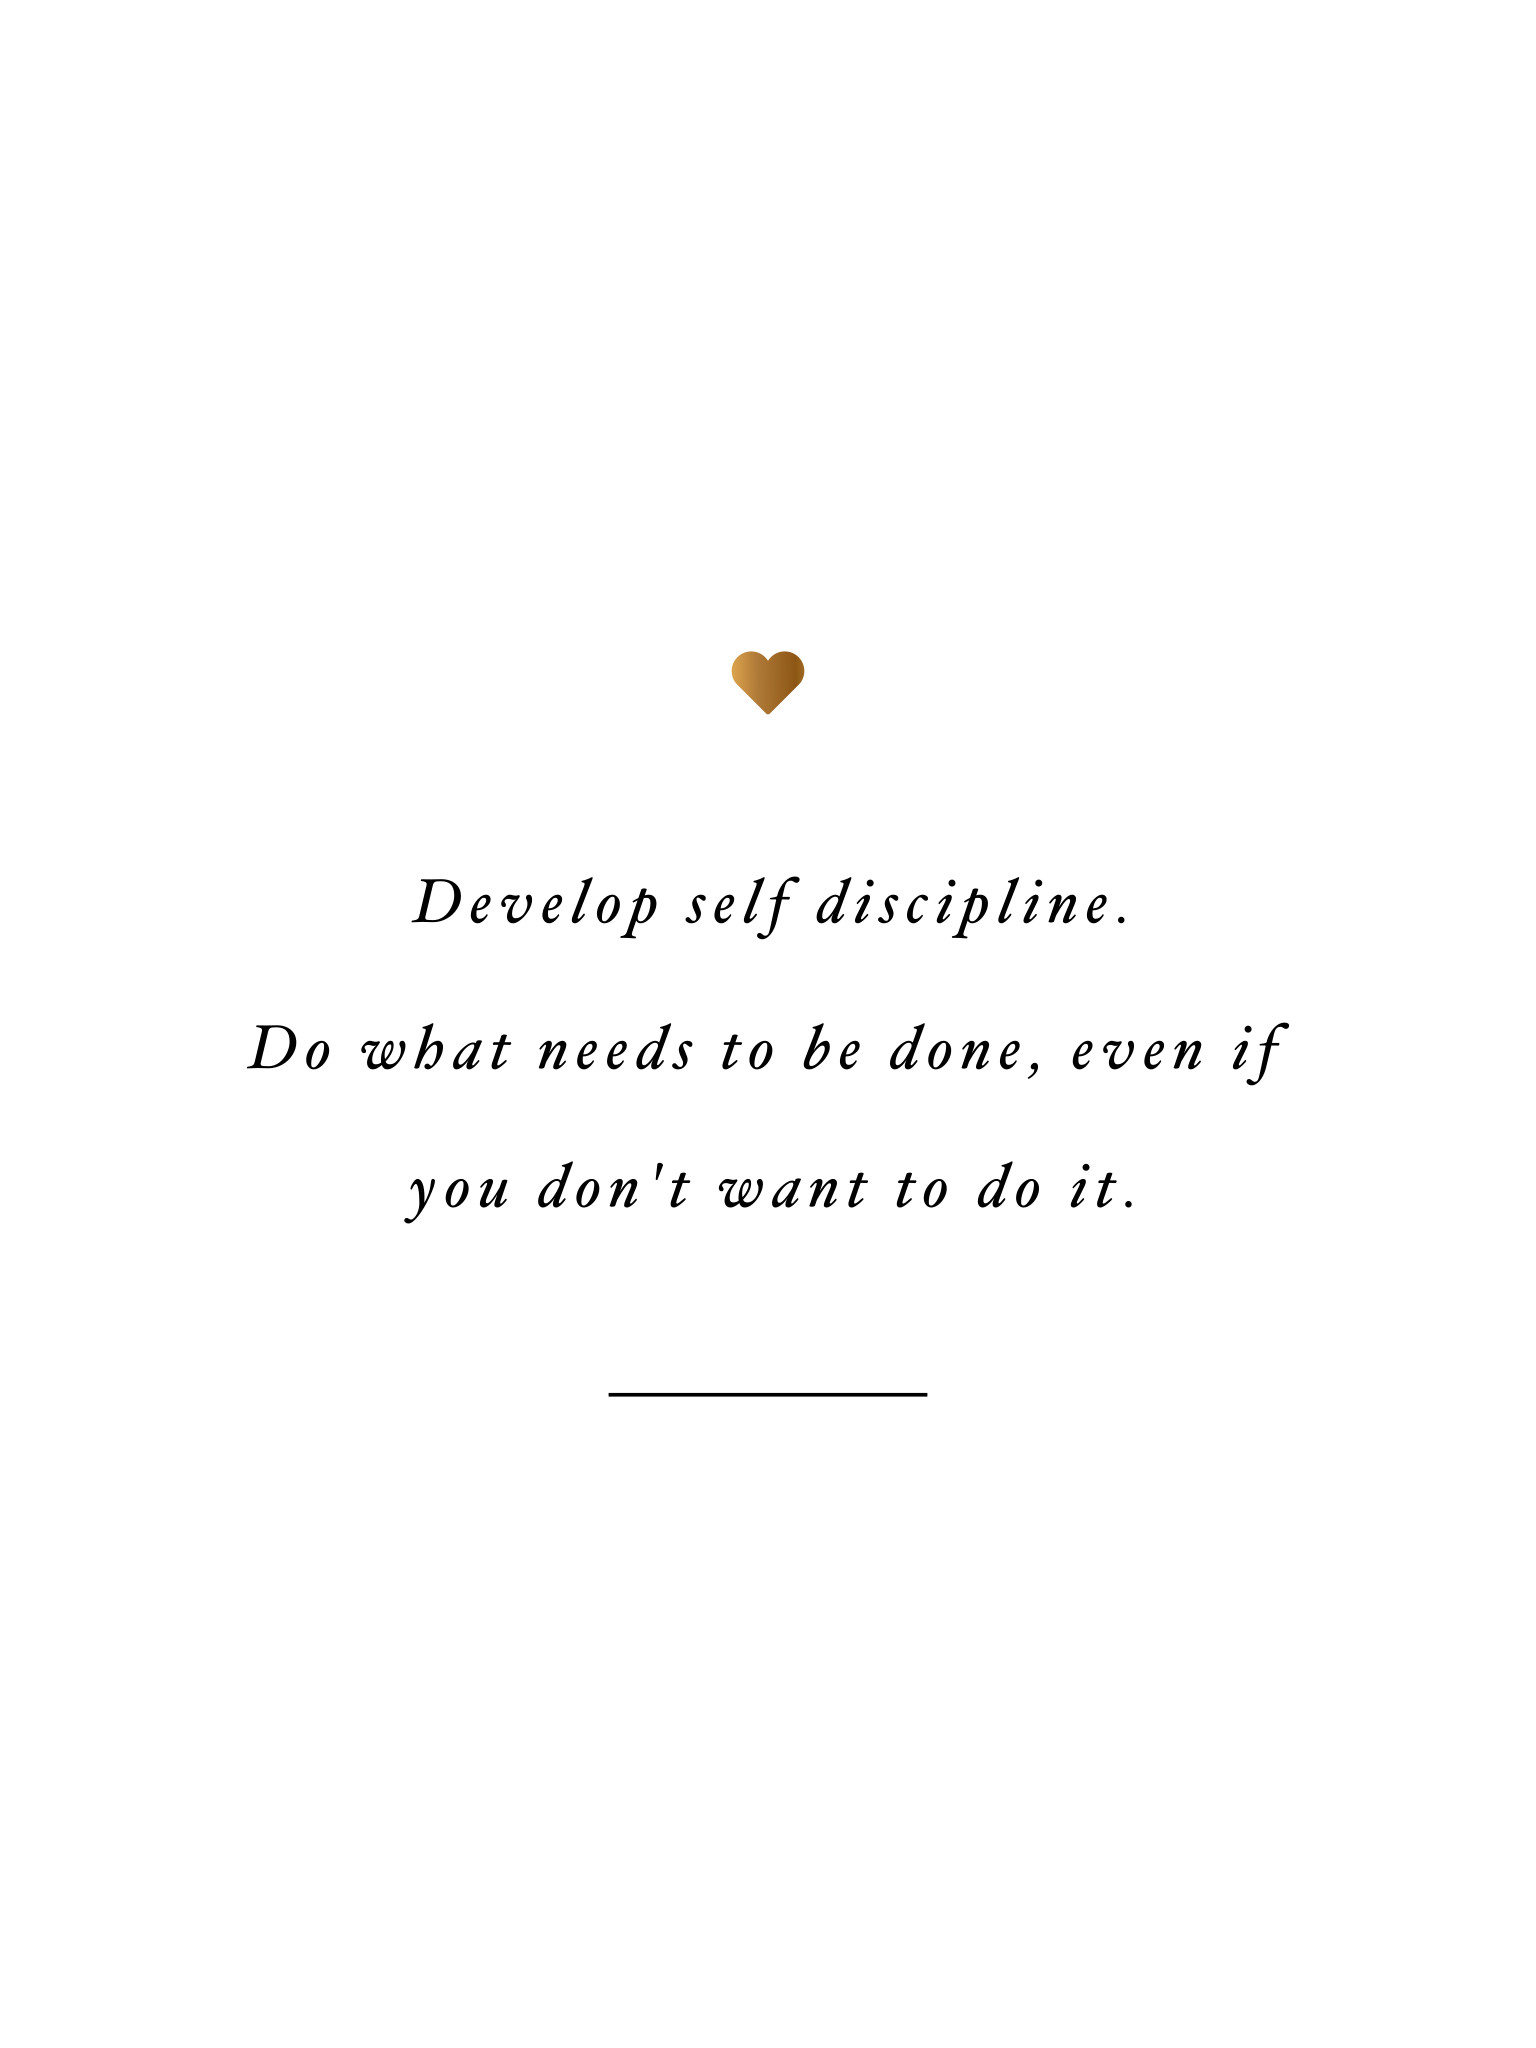 Develop Self Discipline Inspirational Wallpapers